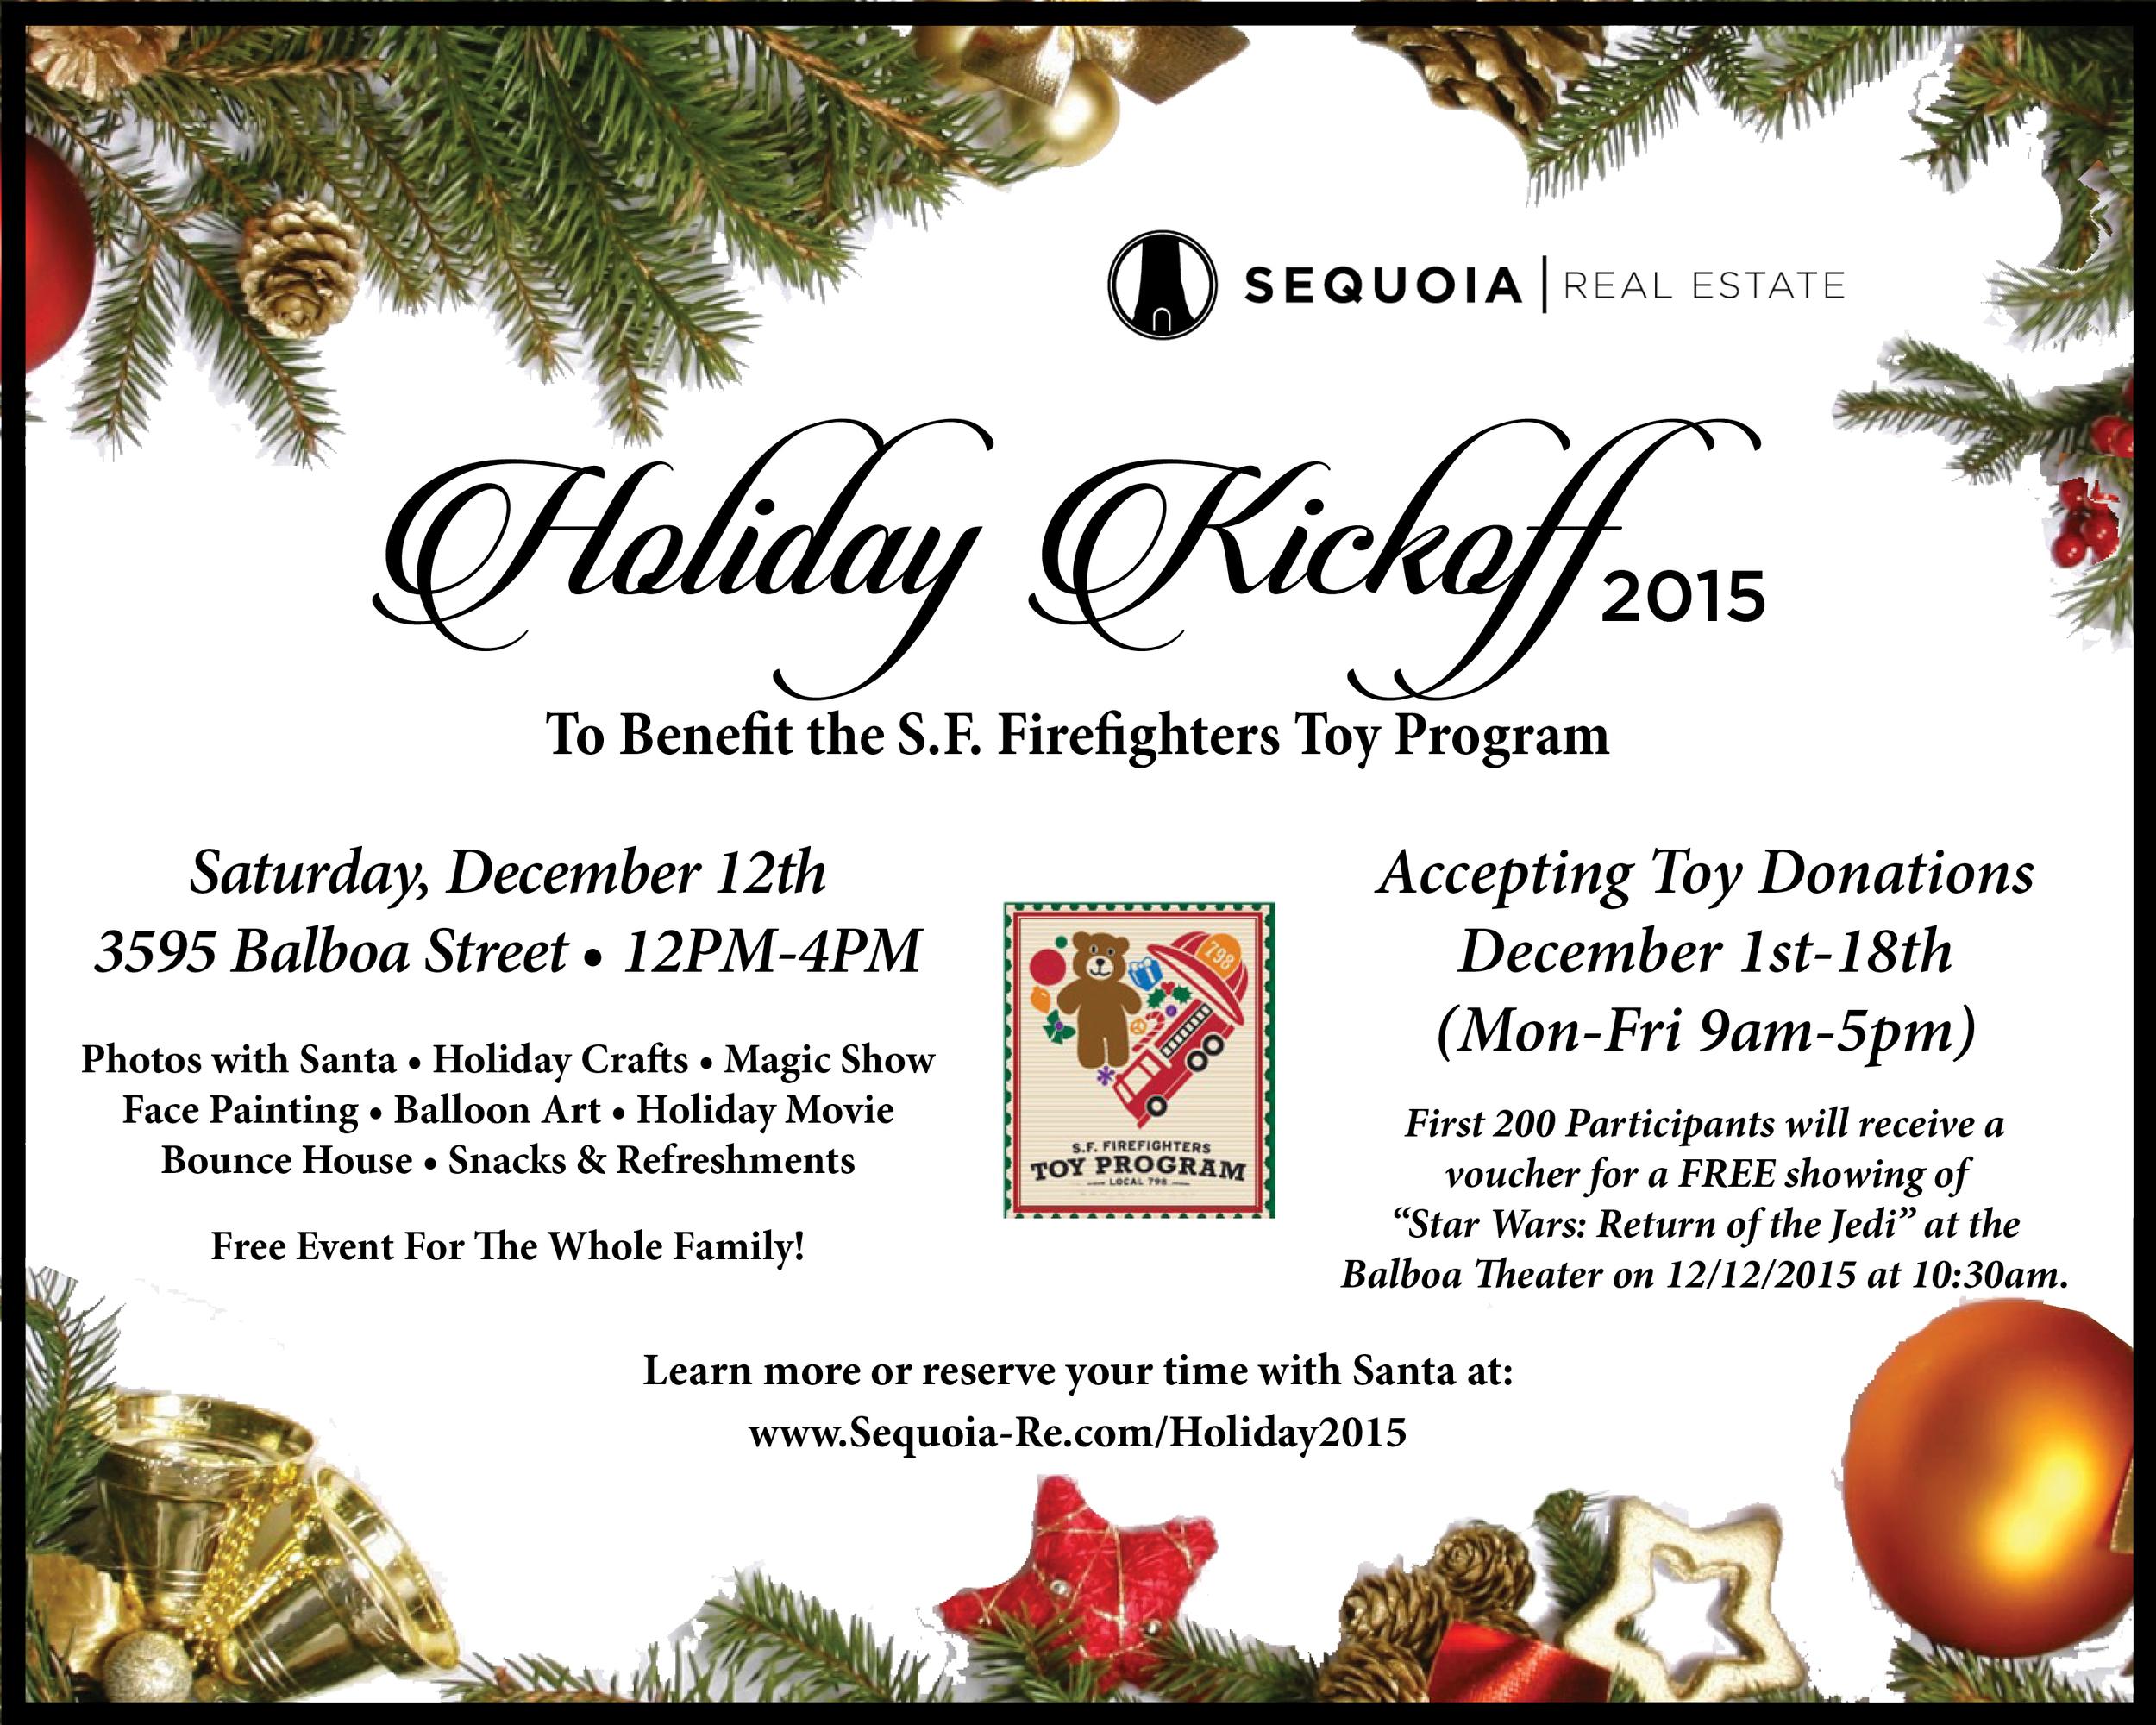 Sequoia Real Estate Holiday Kickoff 2015